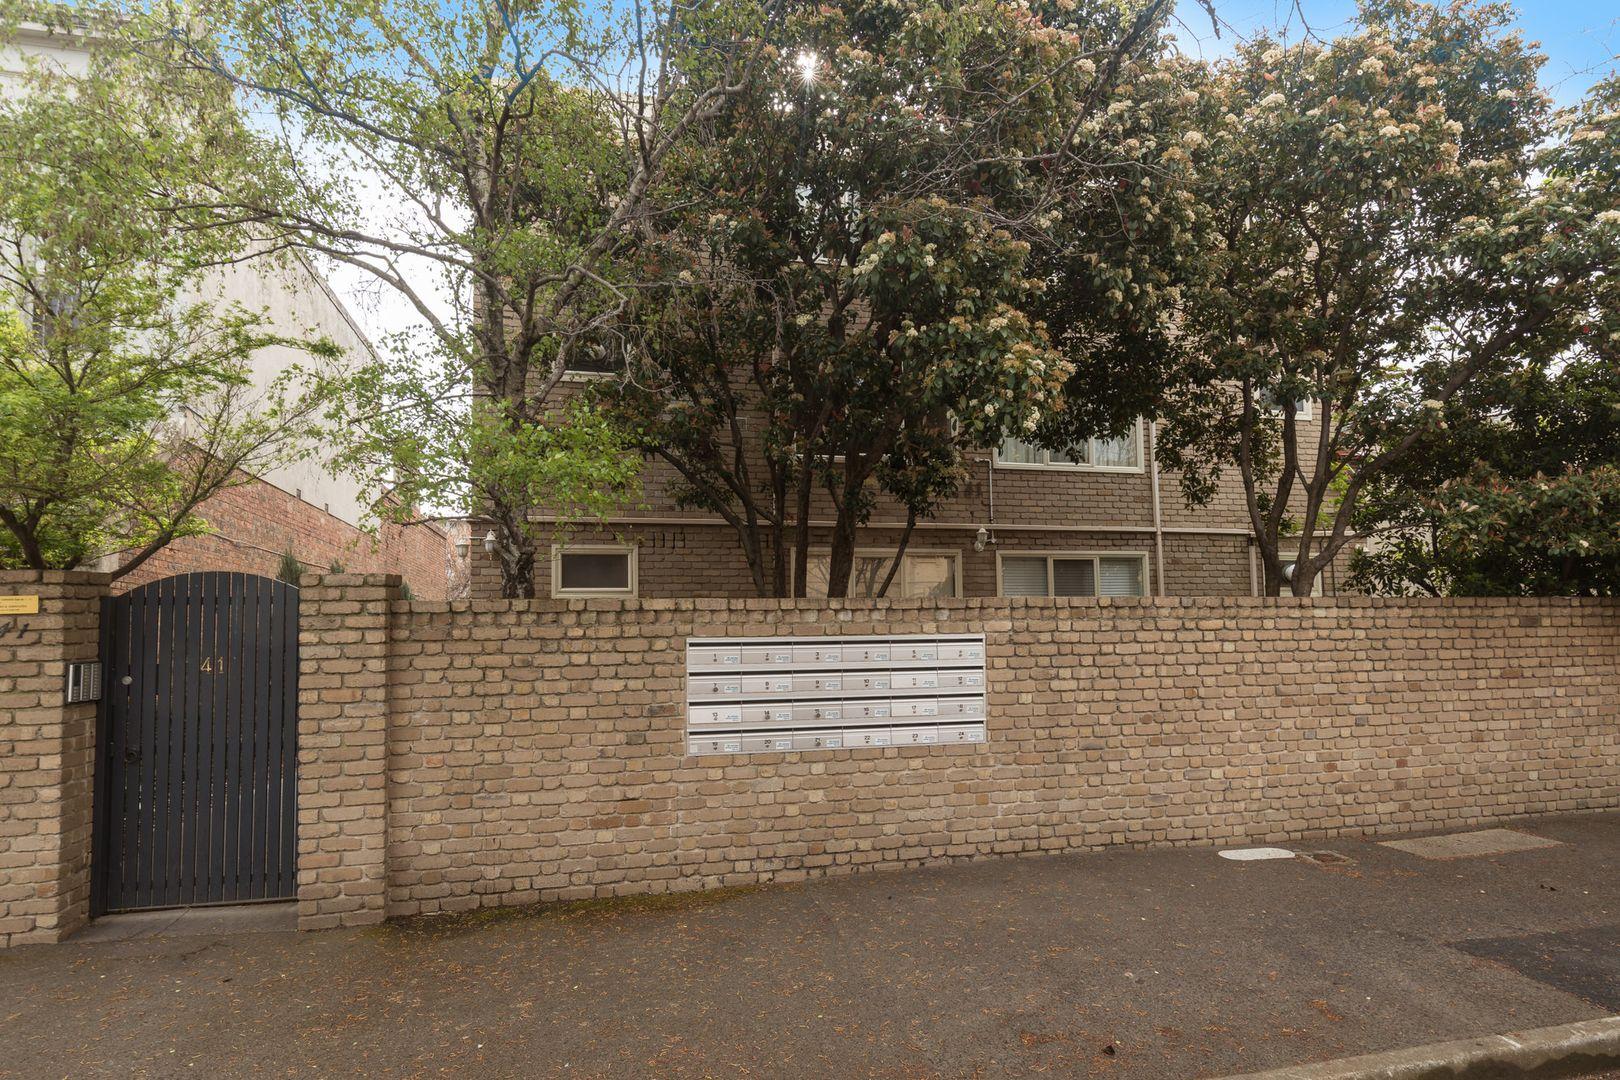 11/41 Napier Street, Fitzroy VIC 3065, Image 0